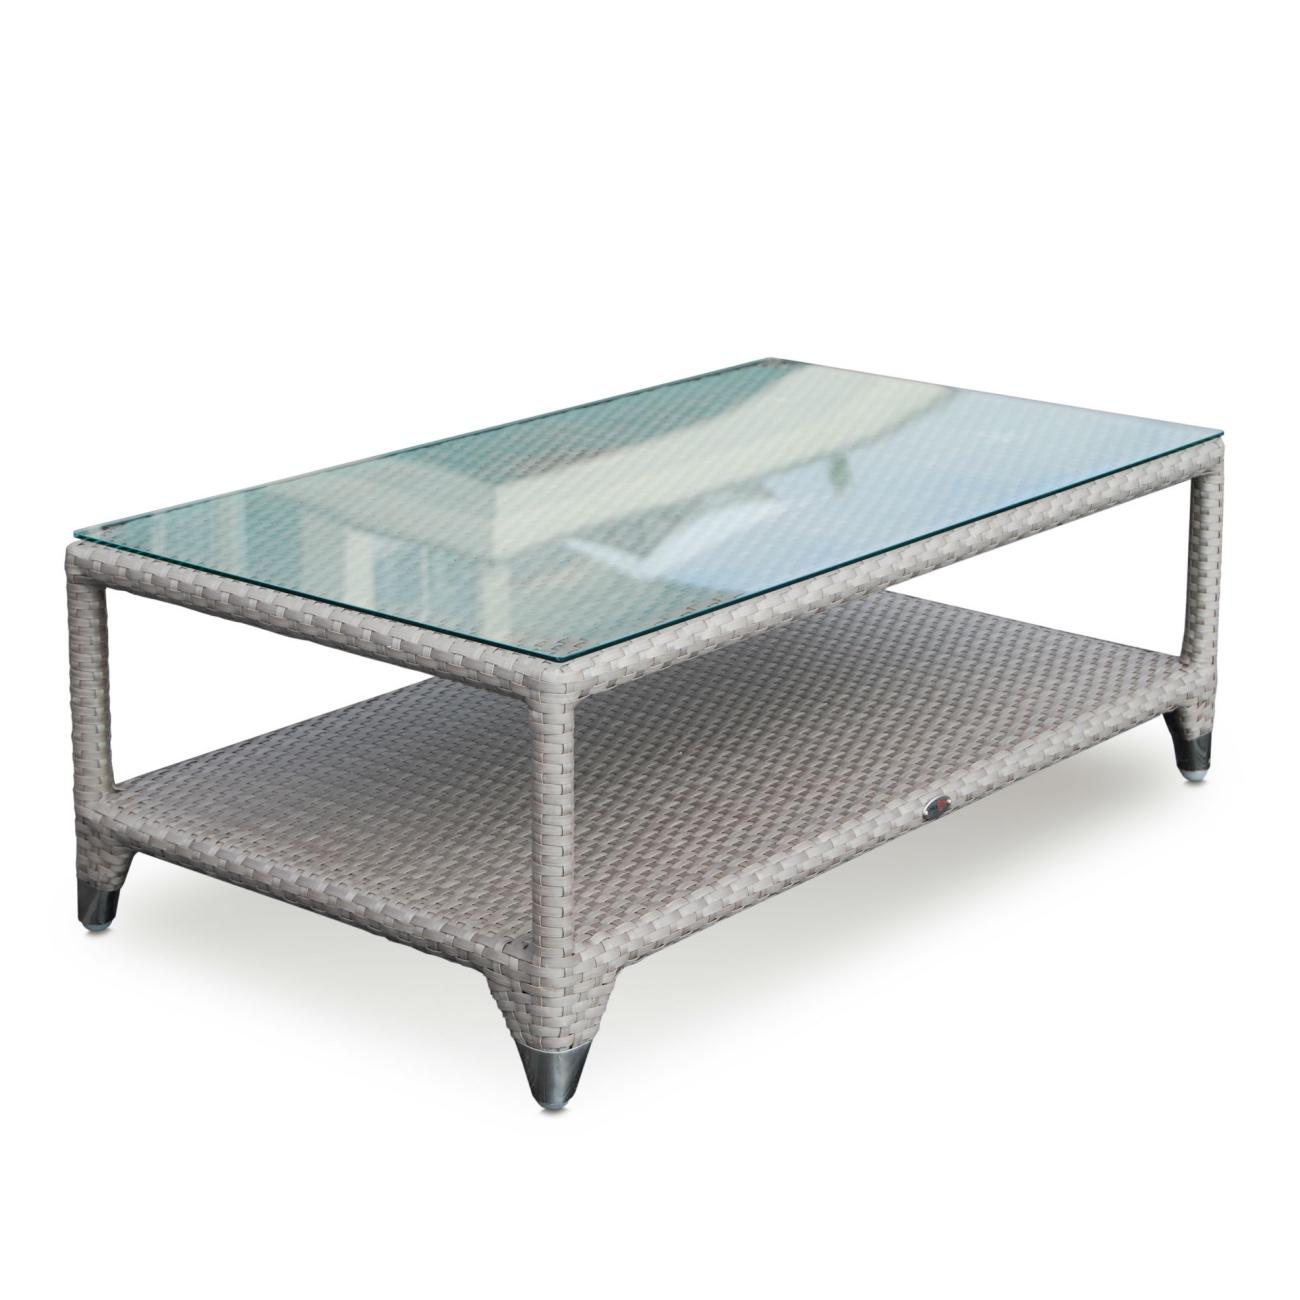 Skyline malta rectangular coffee table luxury outdoor living for Outdoor furniture malta